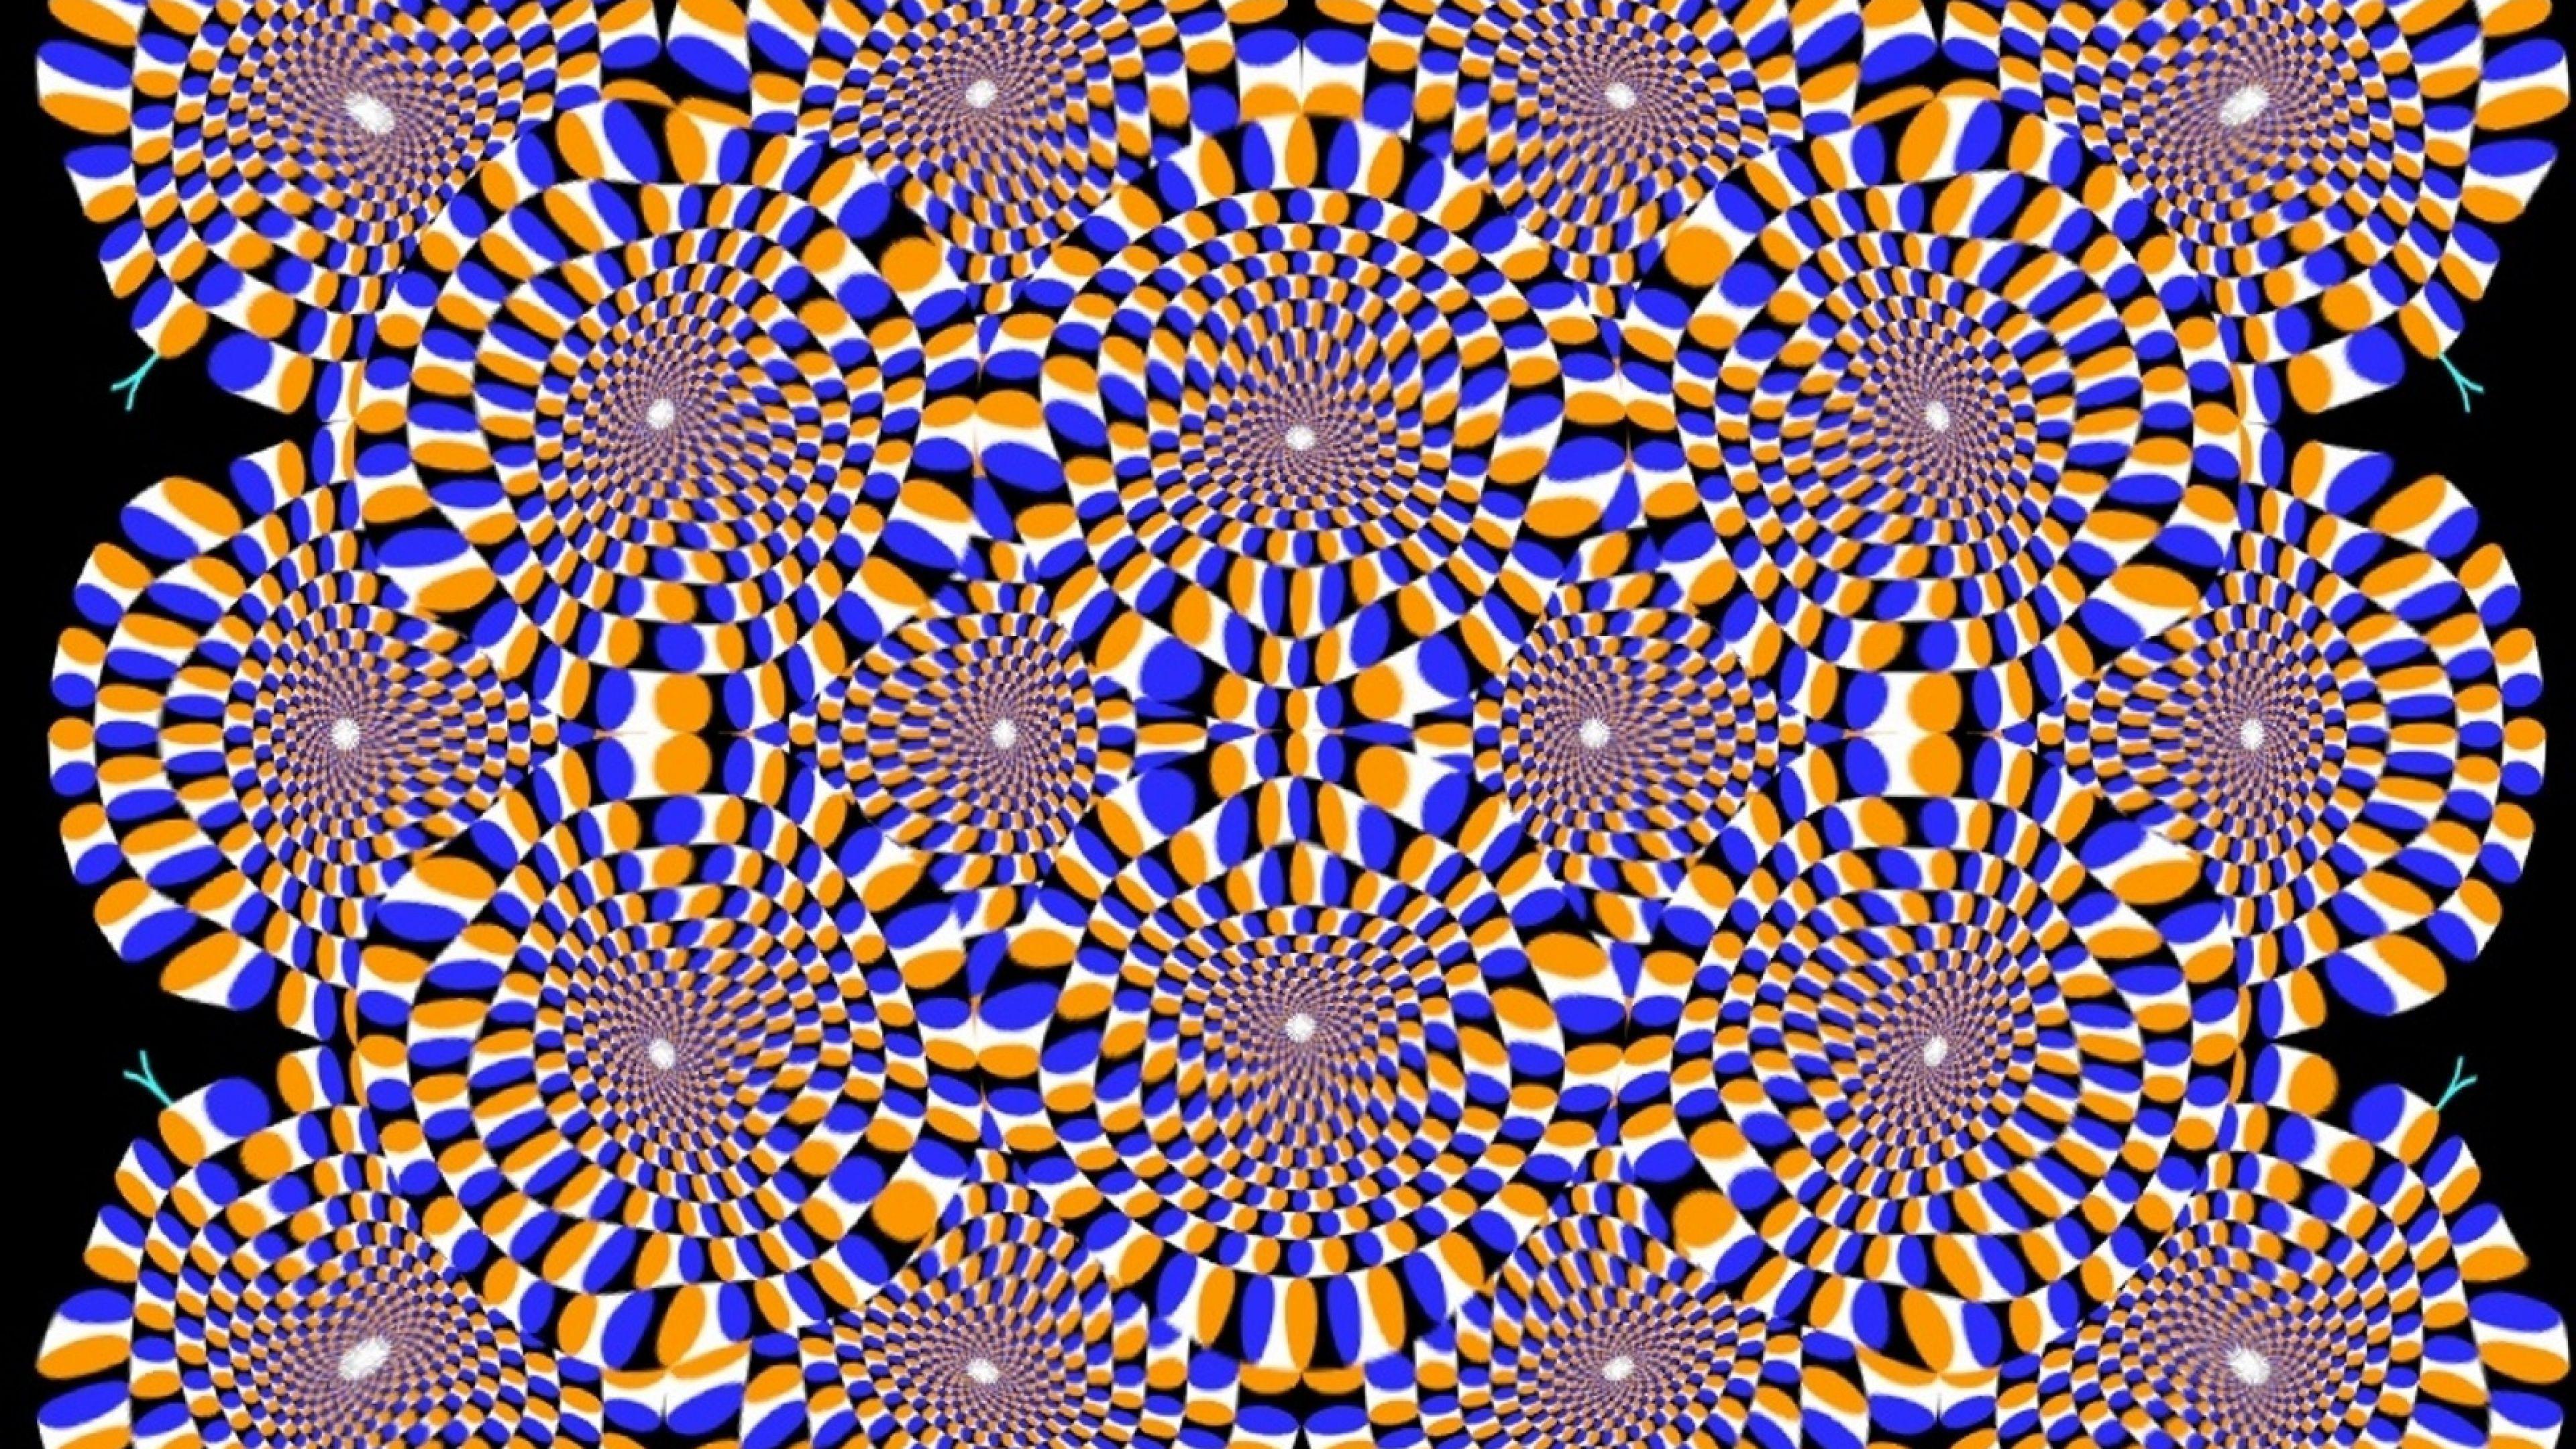 Optical Illusion 4k Wallpapers Top Free Optical Illusion